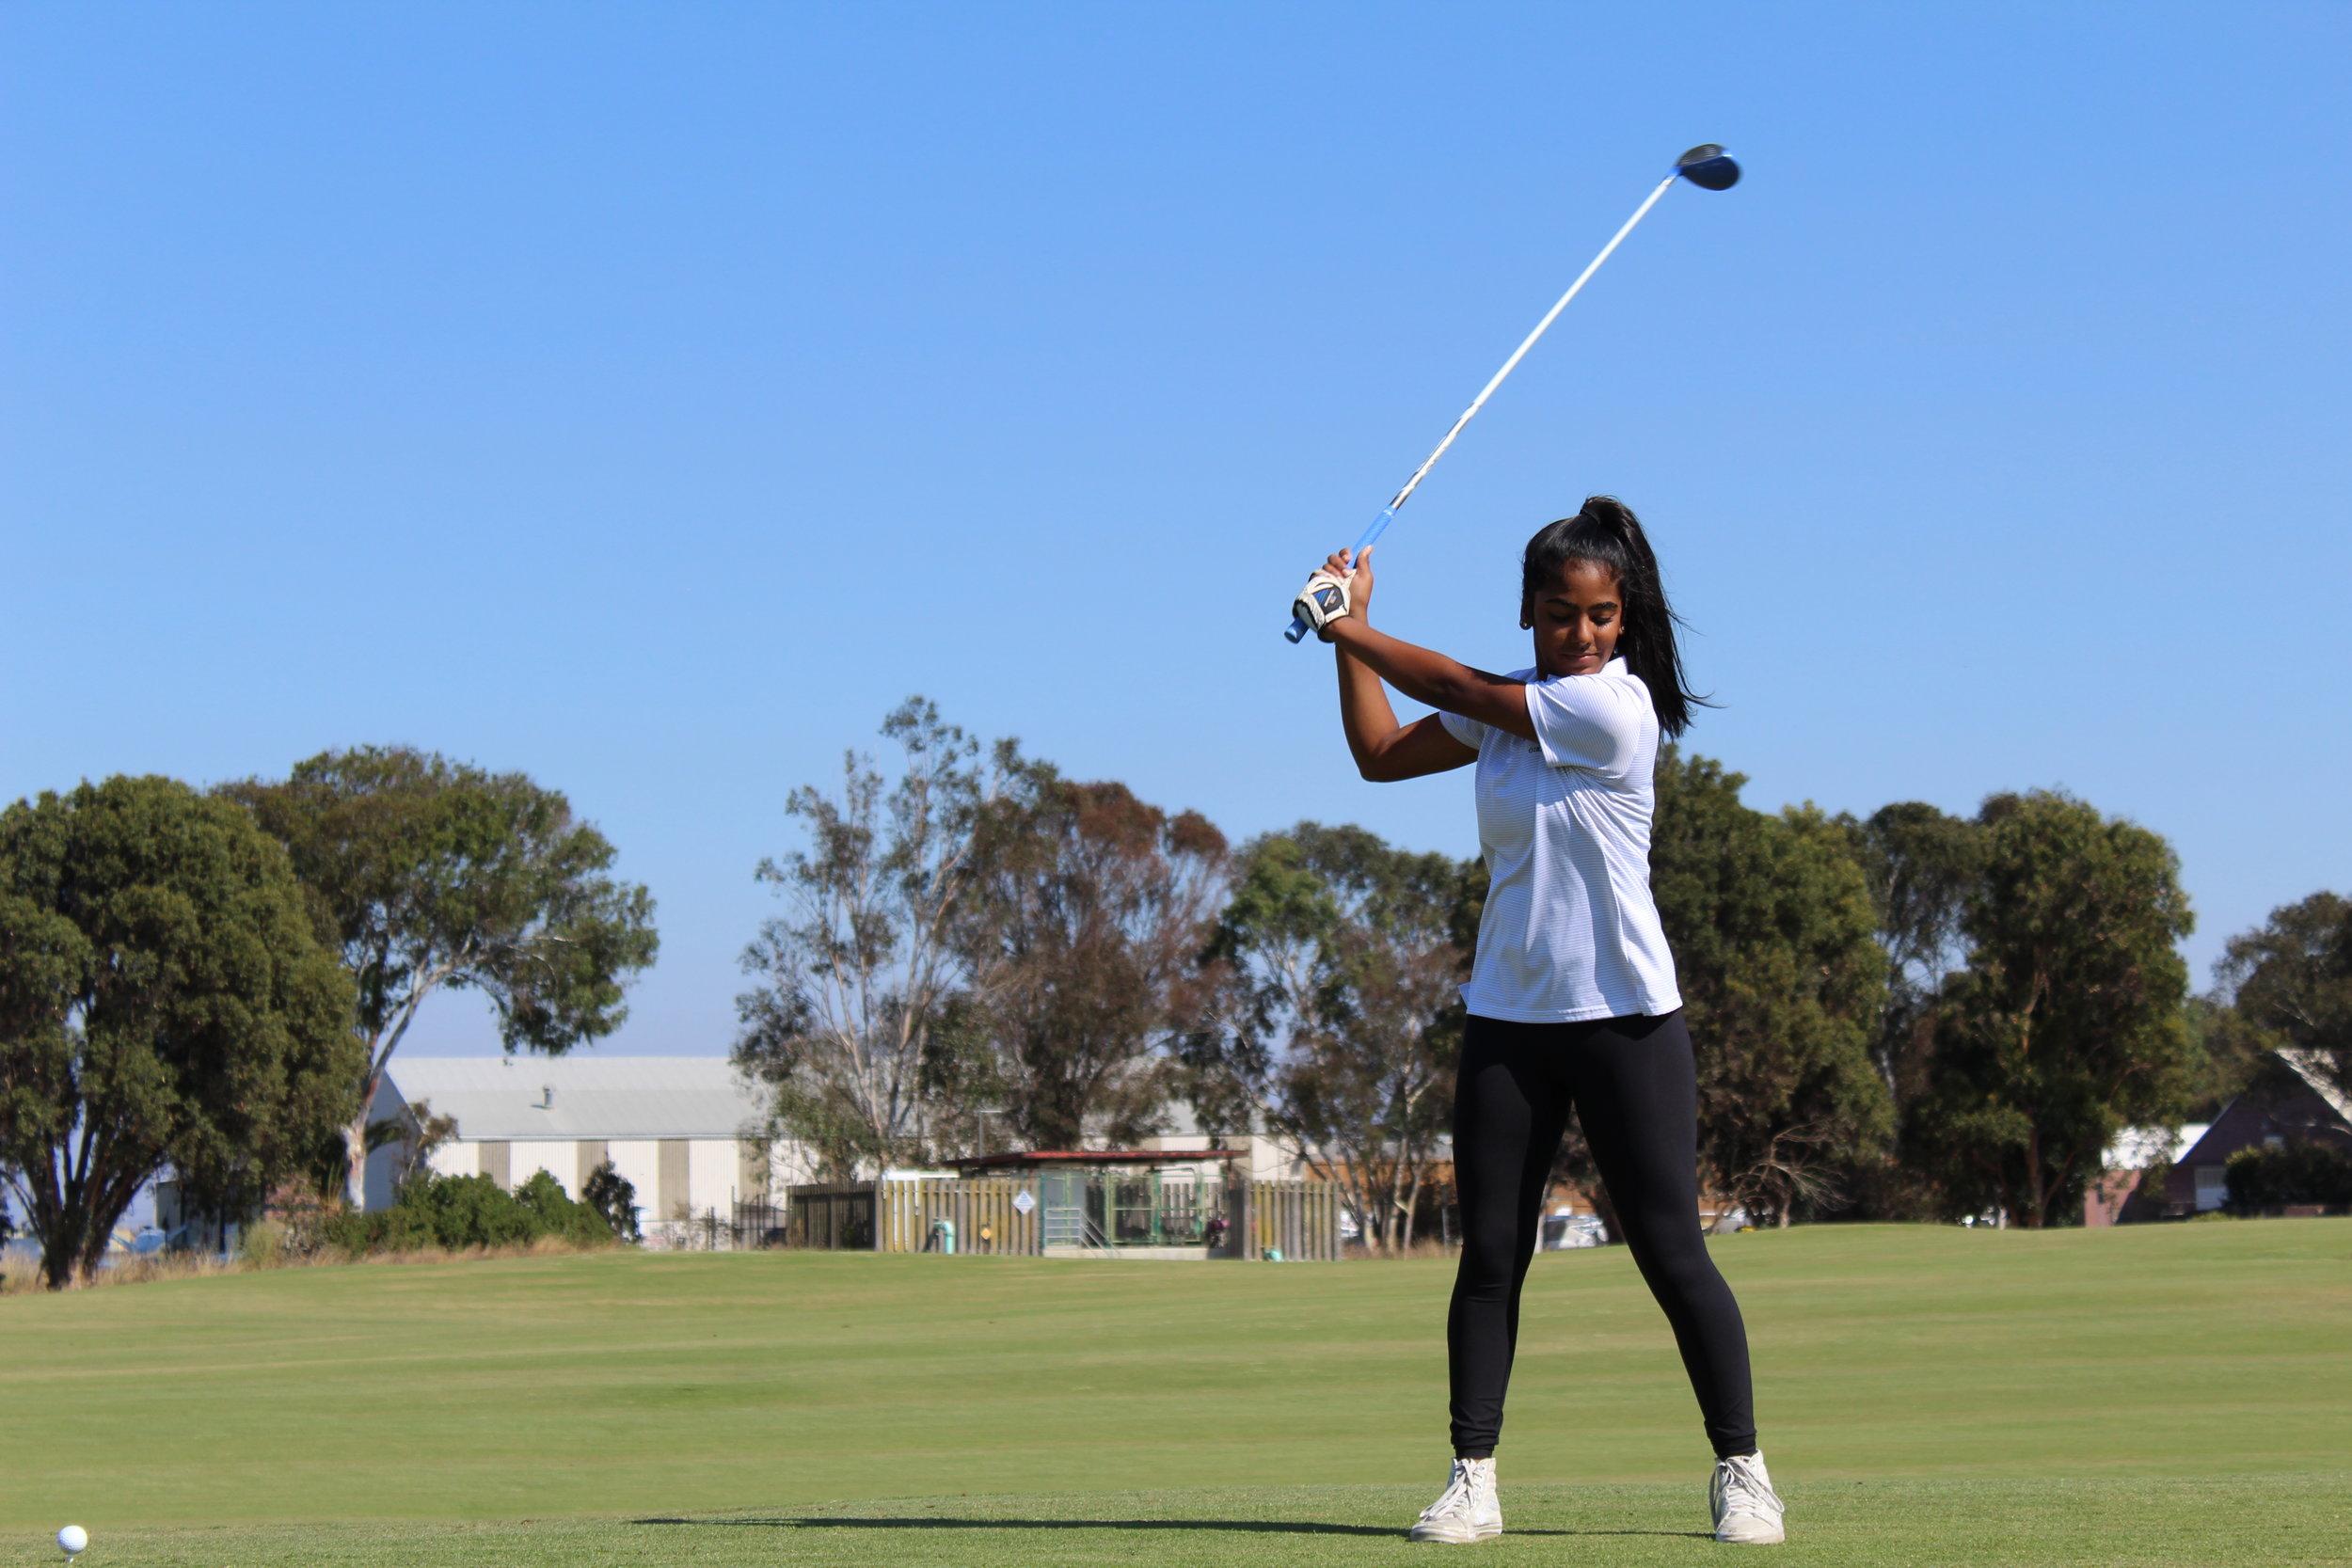 Golf, badminton, tennis (doubles) = Moderate Intensity